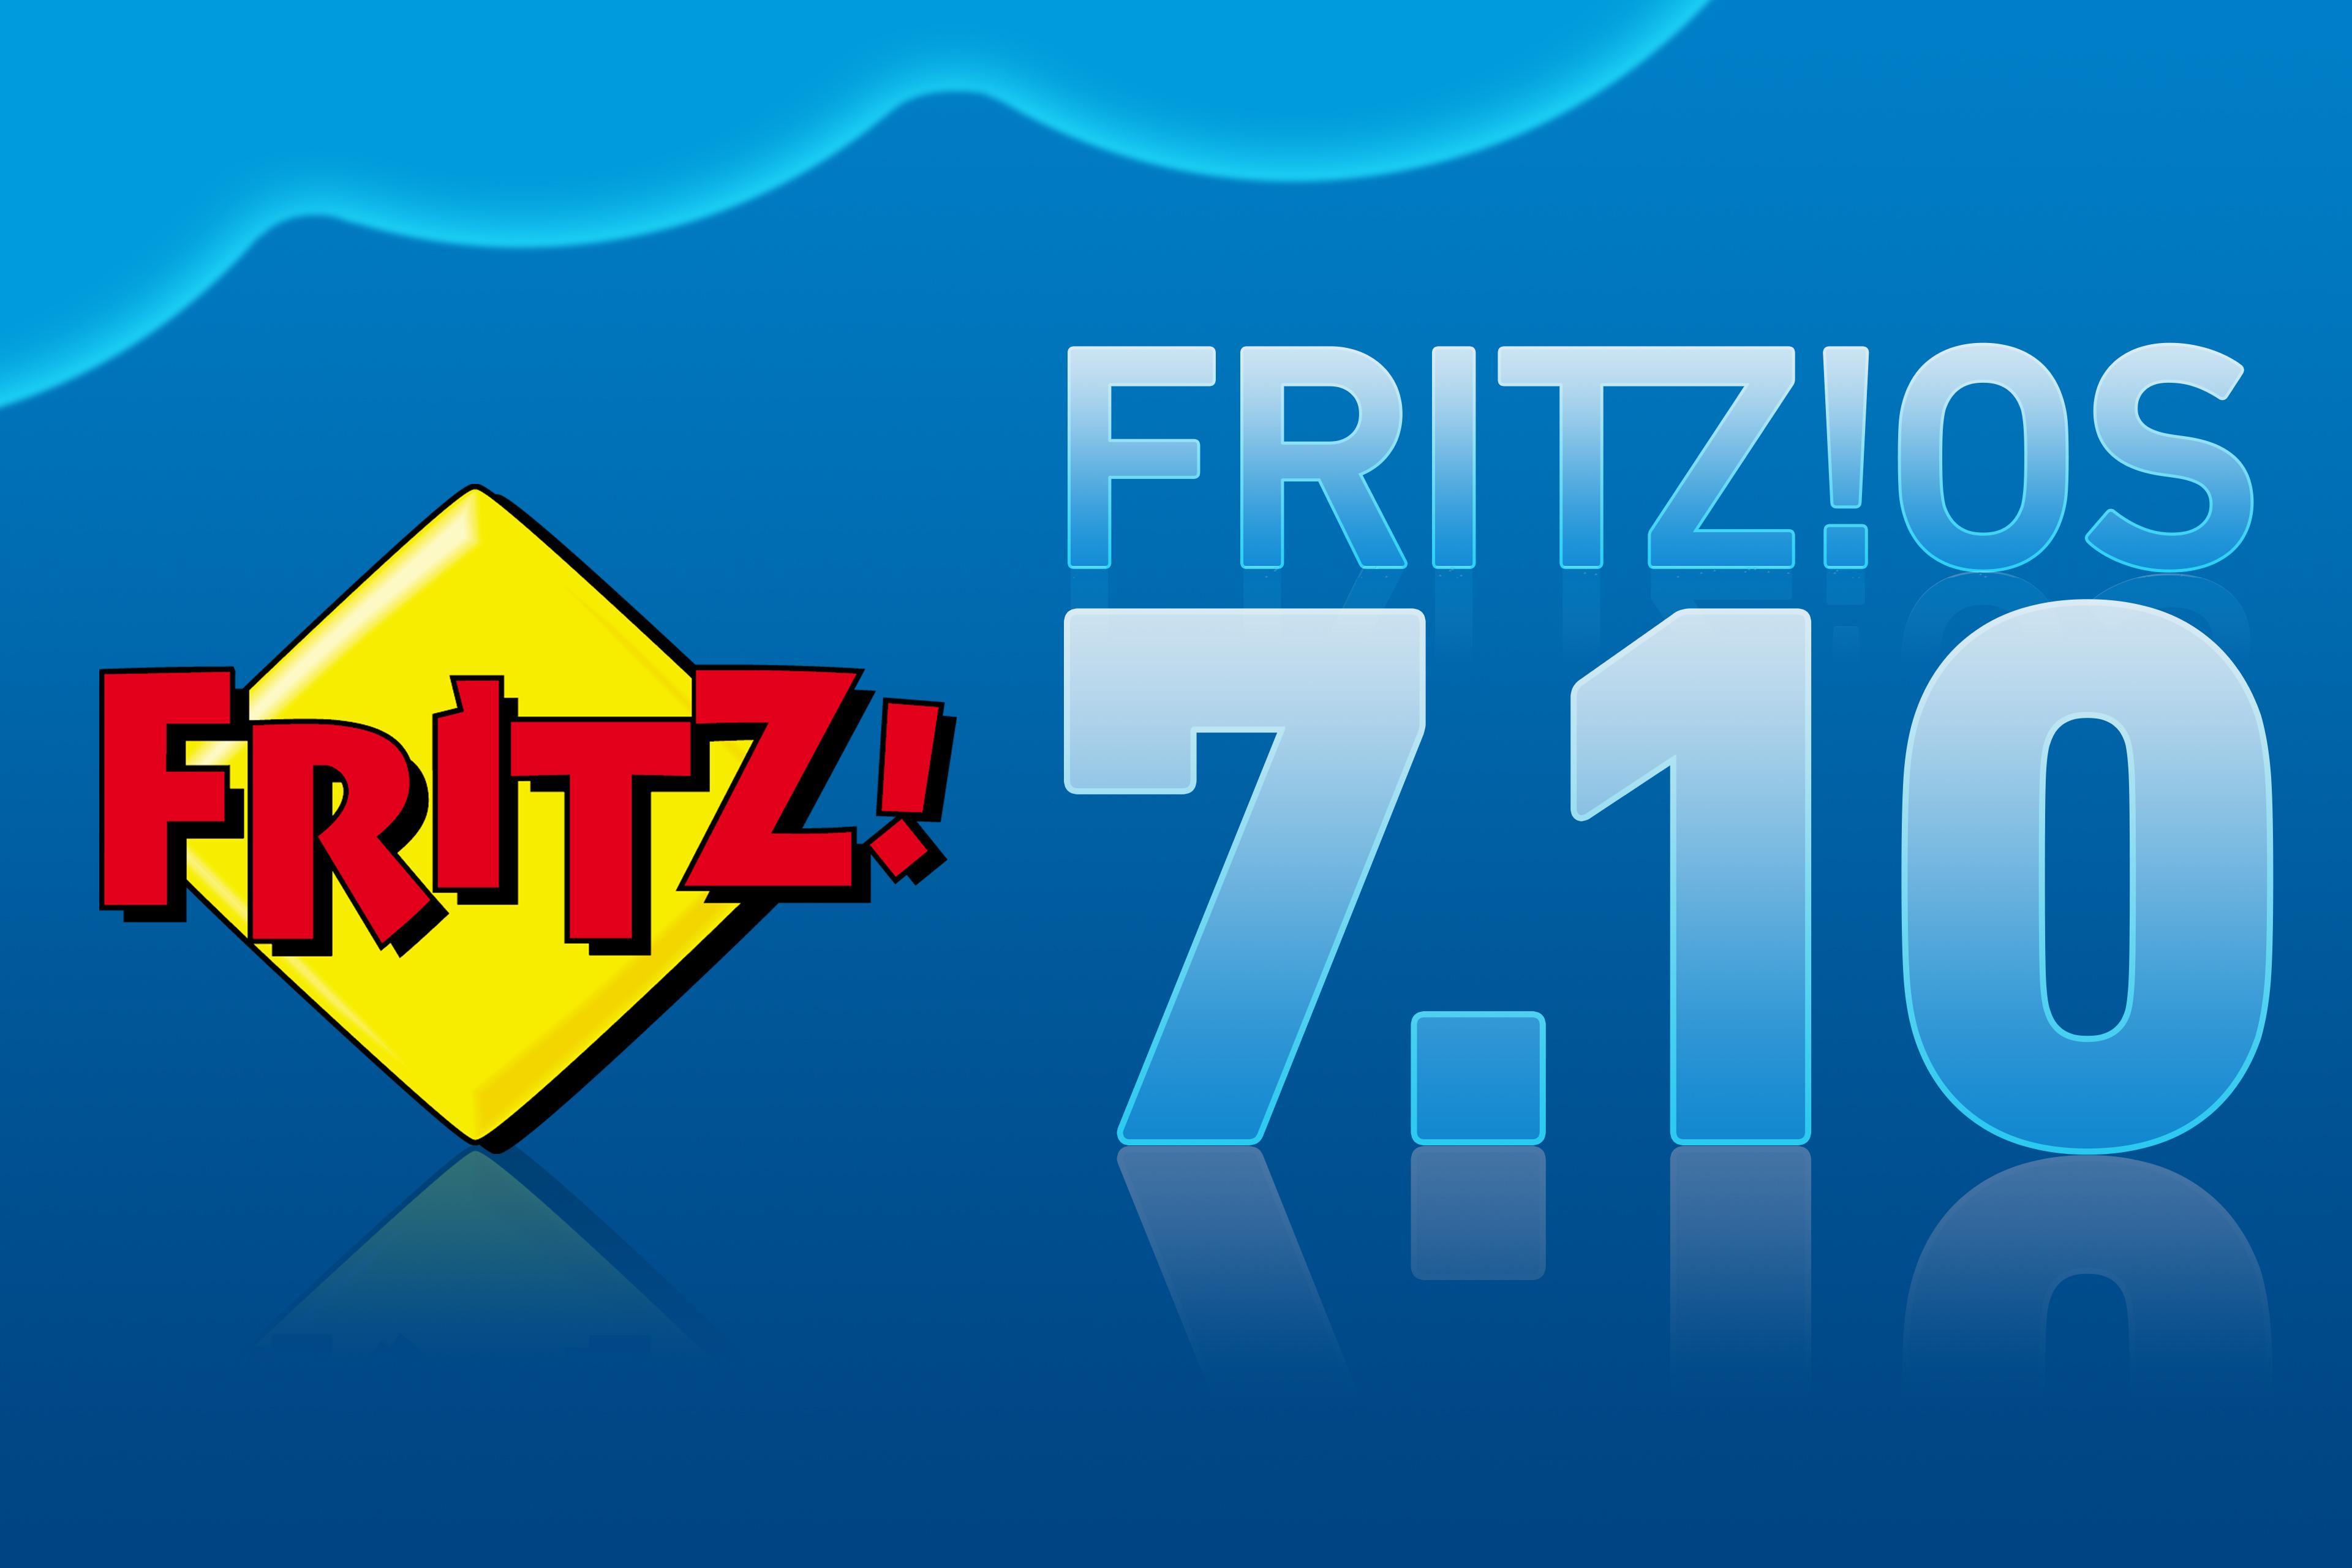 311241 avm fritzos 710 f39116 original 1556784864